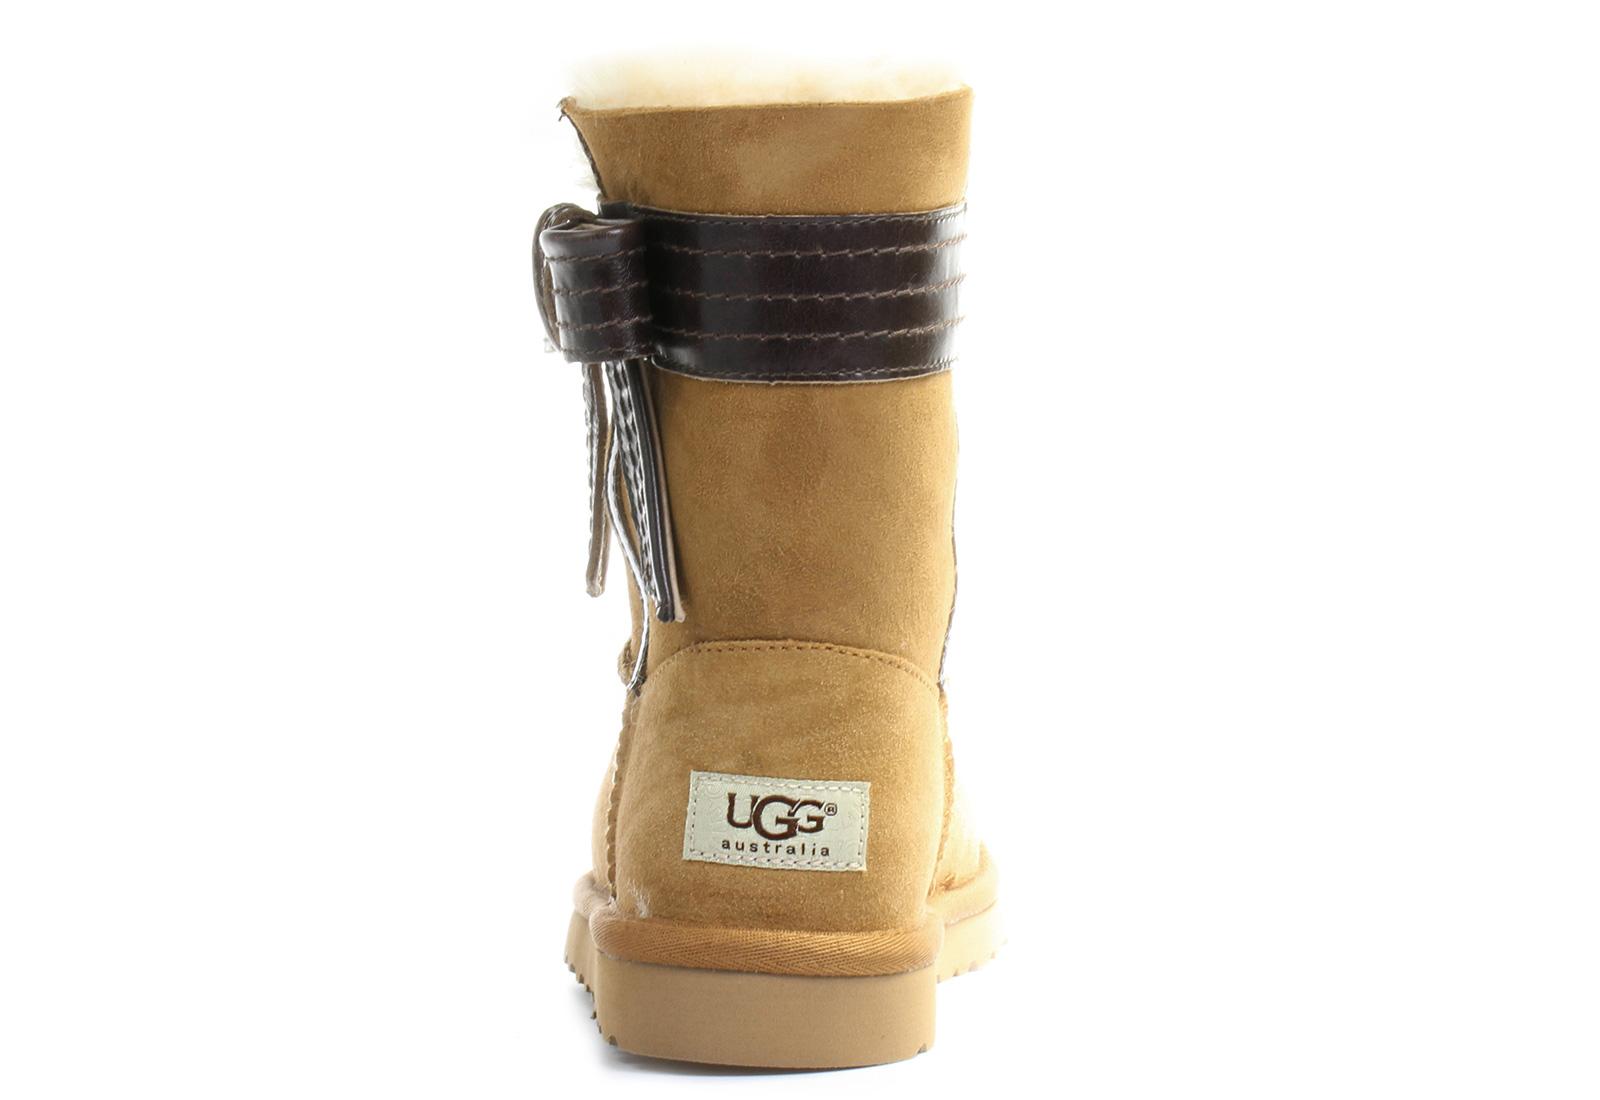 Ugg Csizma - W Josette - 1003174-che - Office Shoes Magyarország 21a59ee980